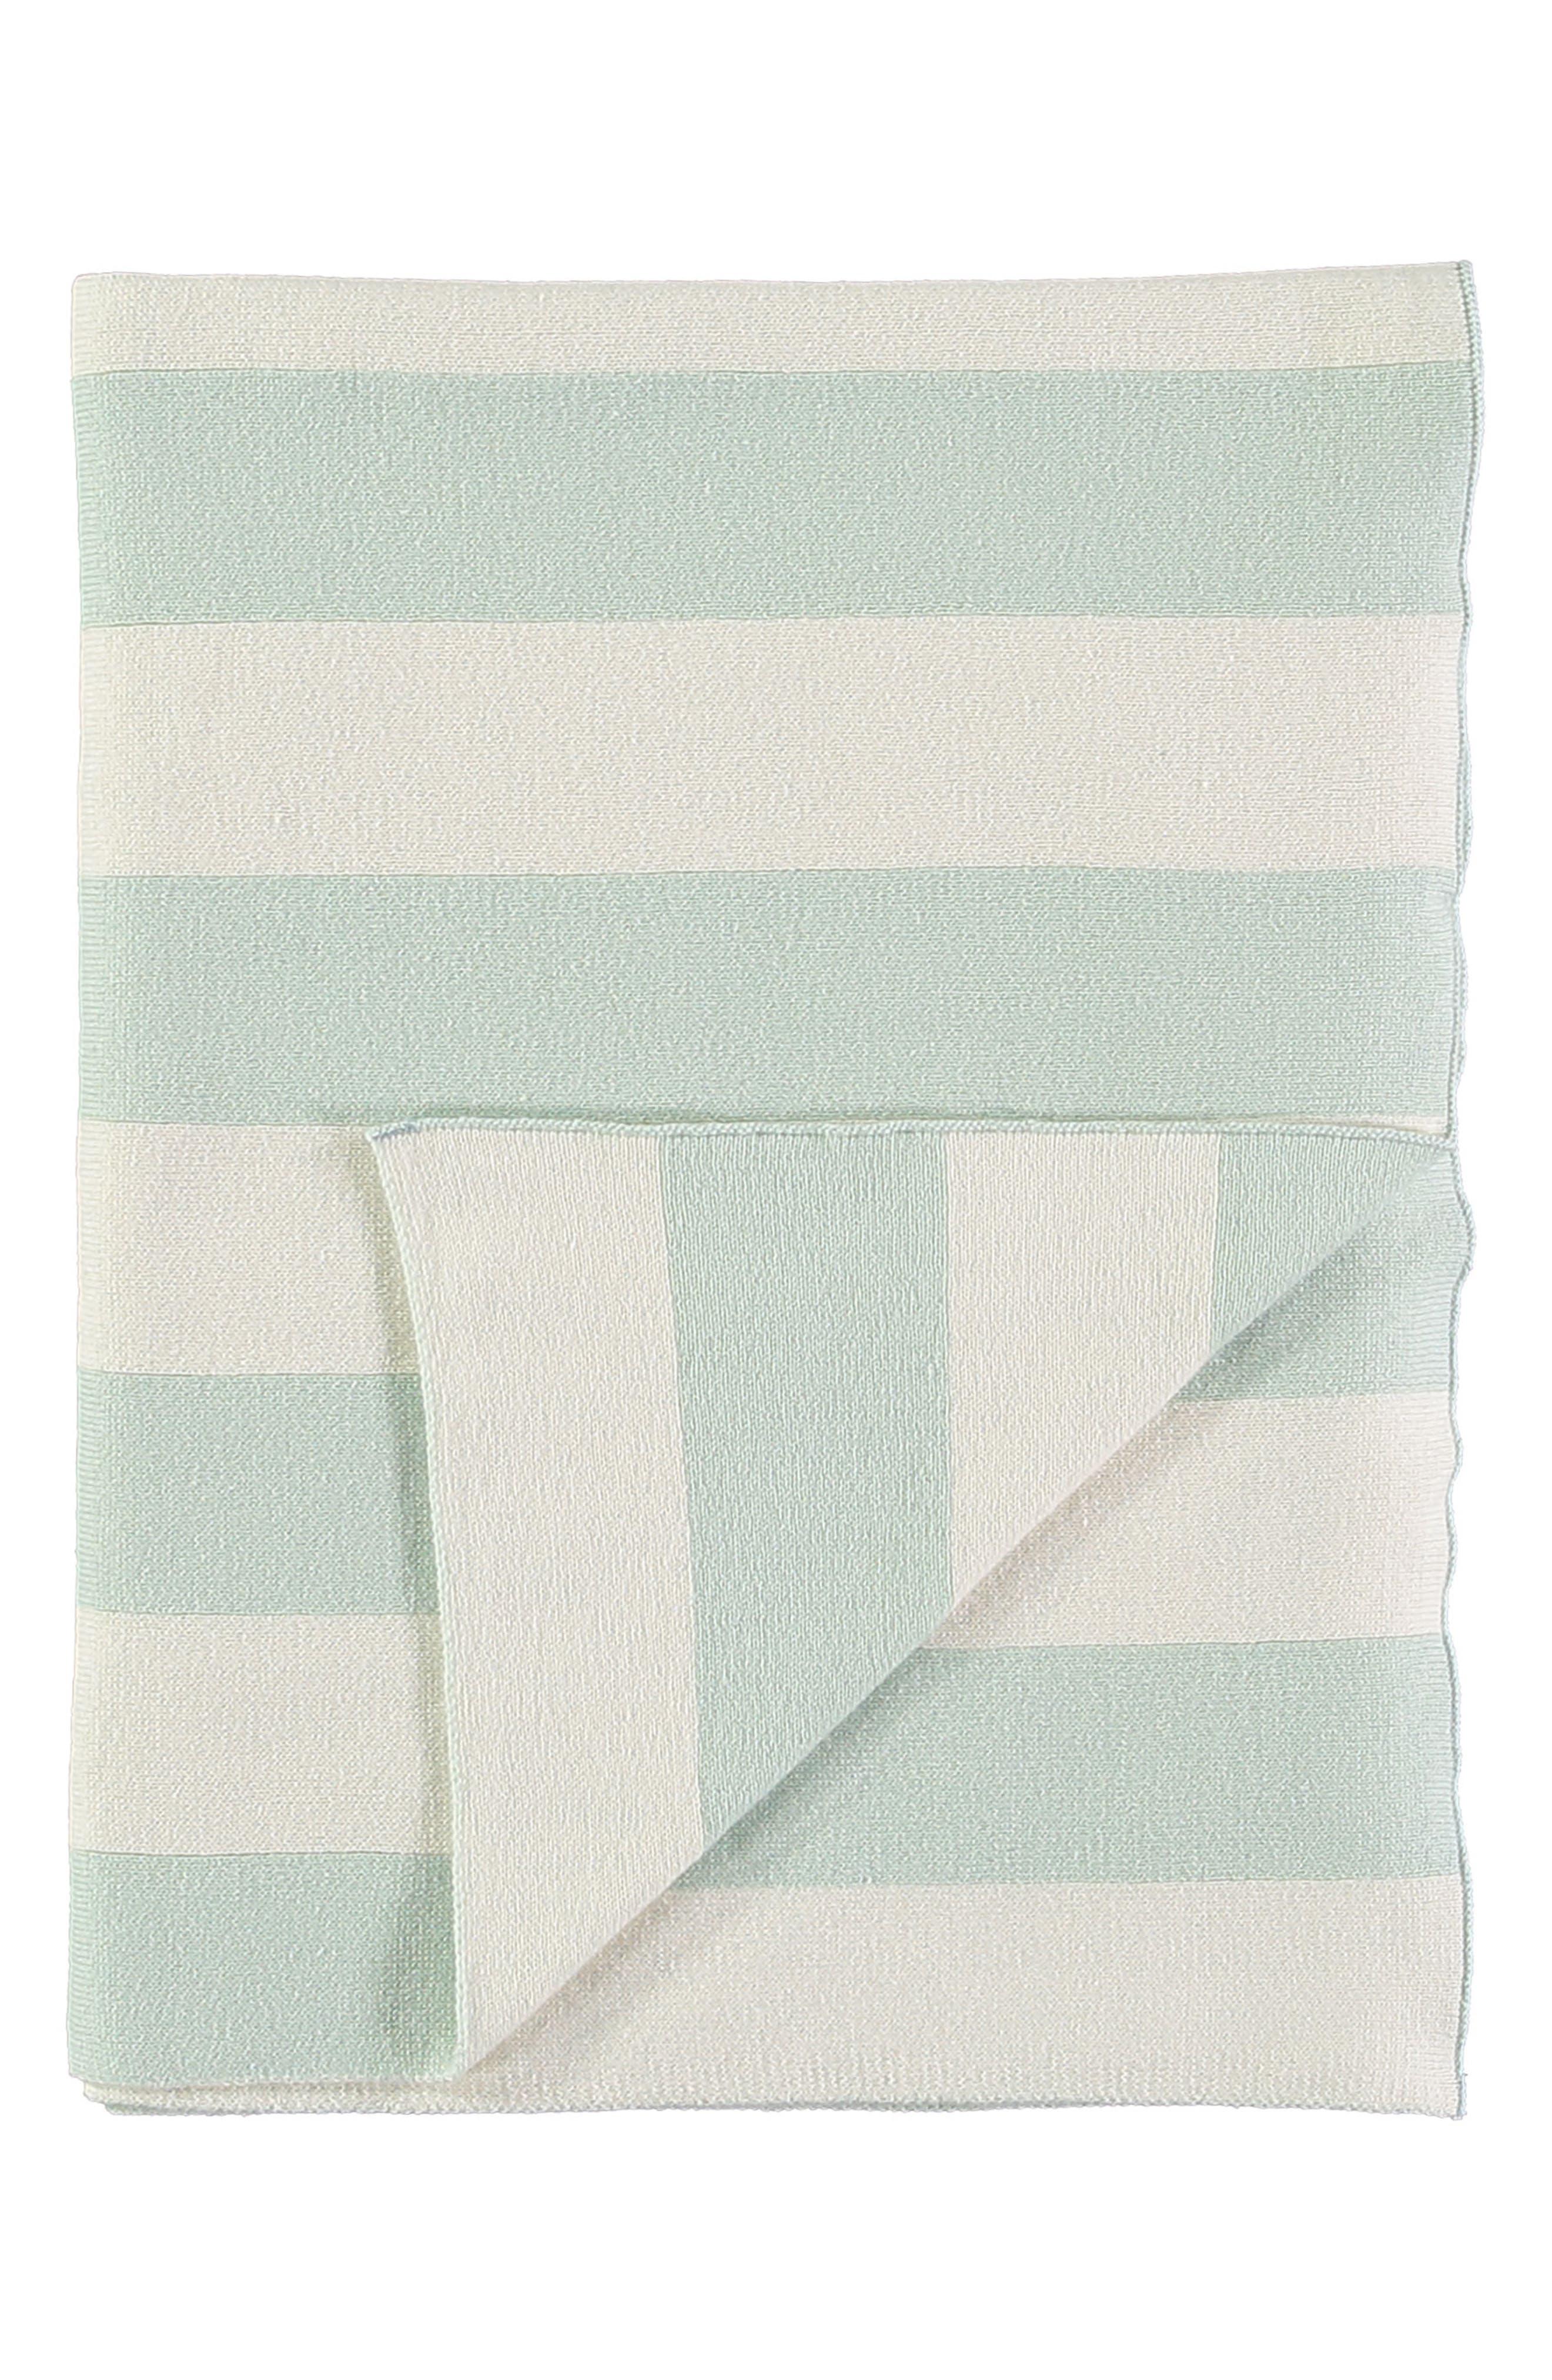 Organic Cotton Knit Blanket,                             Main thumbnail 1, color,                             MINT